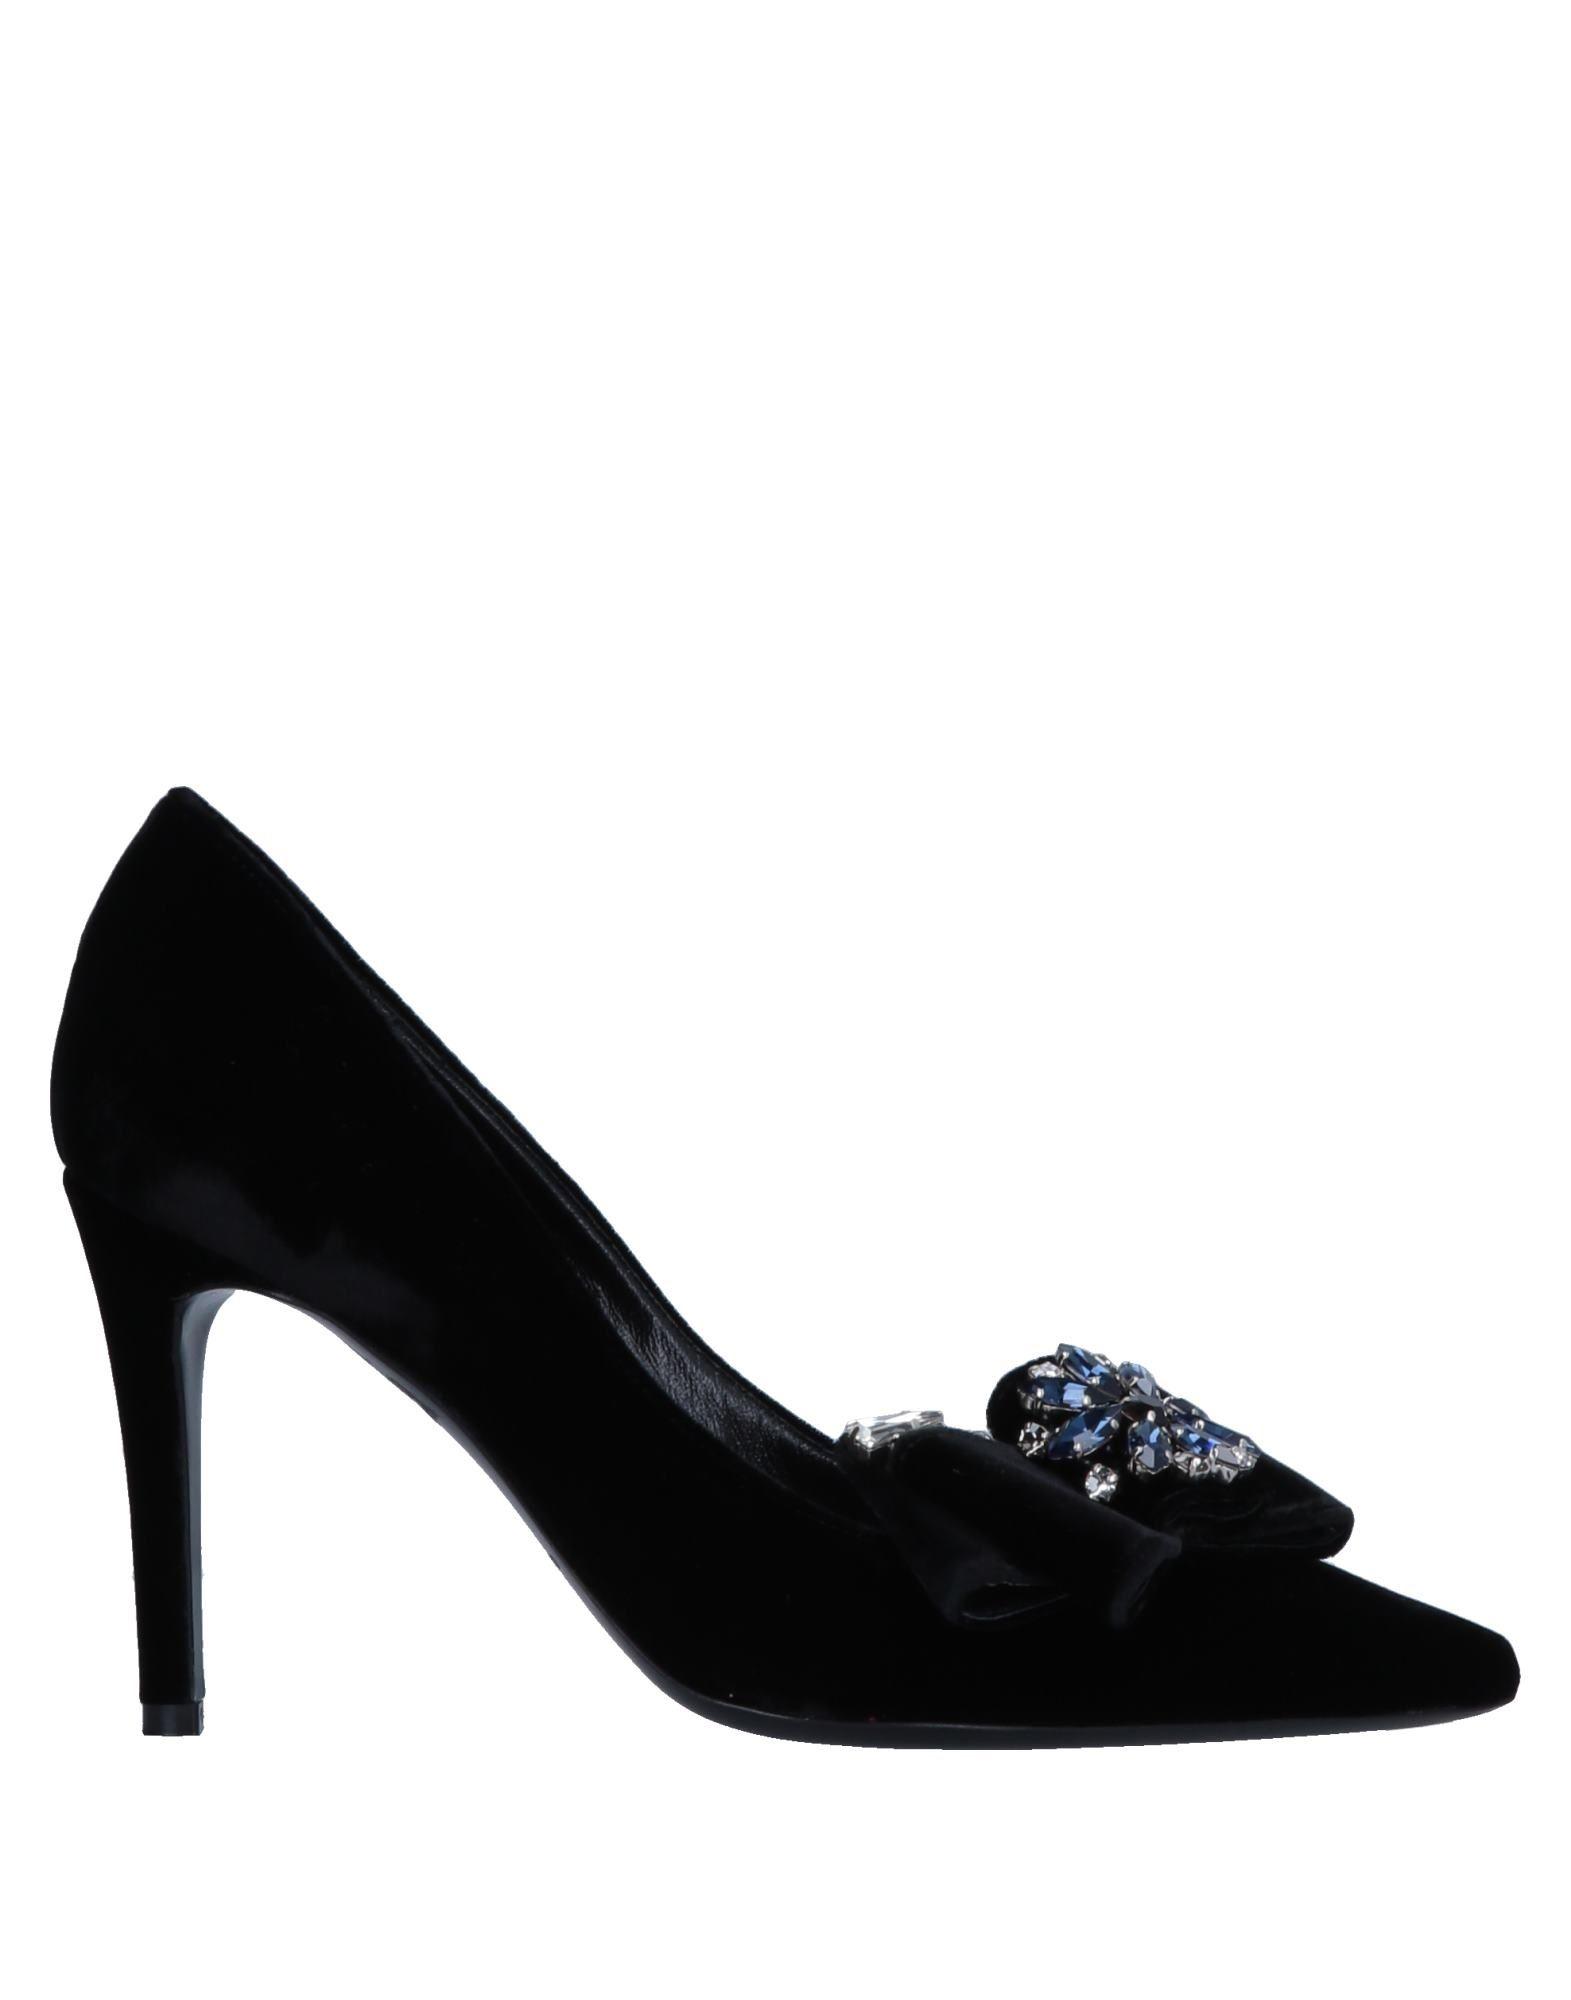 Descuento de la Deimille marca Zapato De Salón Deimille la Mujer - Salones Deimille  Negro cbf424